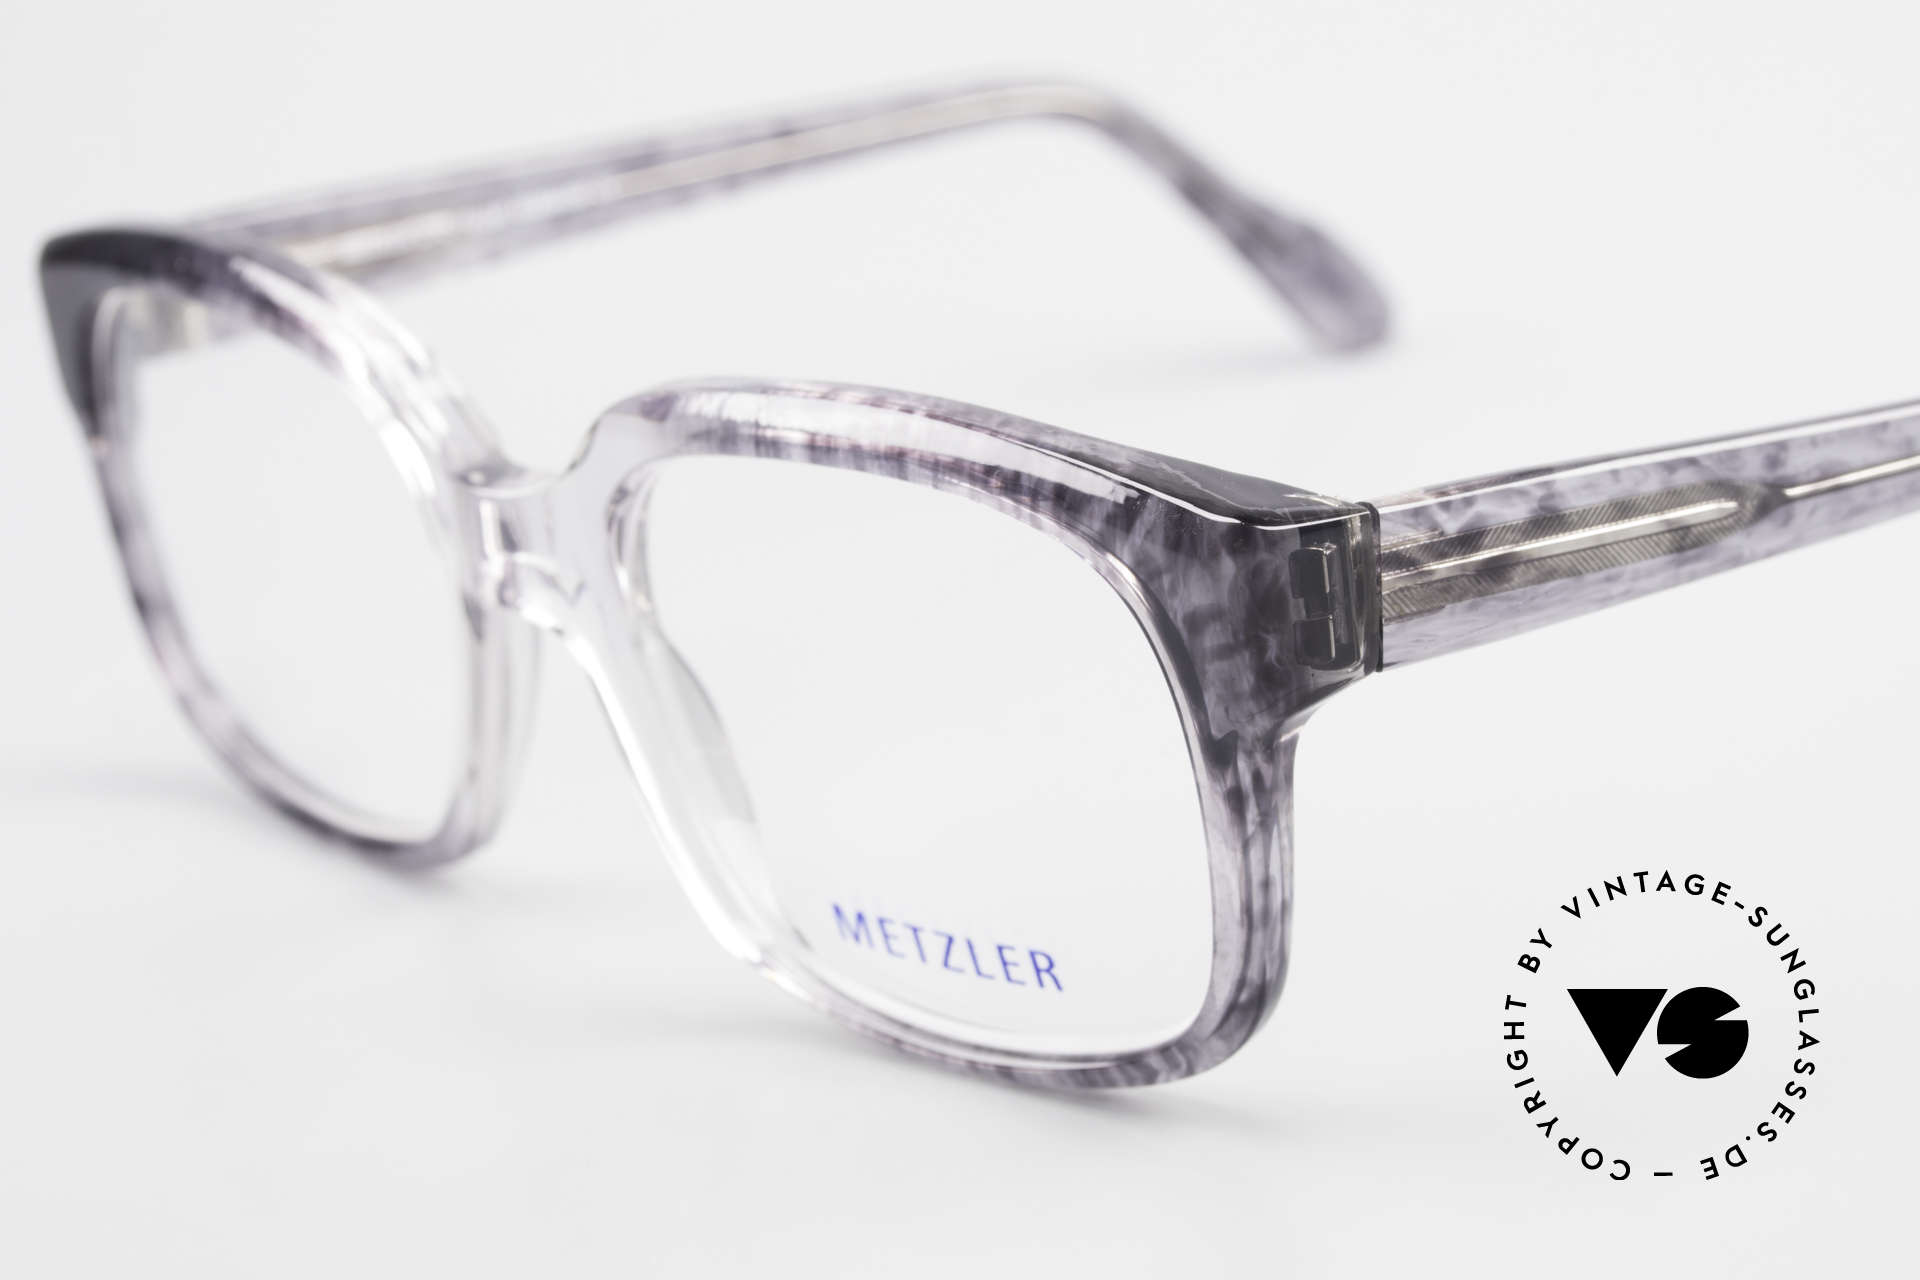 Metzler 7665 Medium 90's Old School Eyeglasses, unworn (like all our rare vintage eyeglass-frames), Made for Men